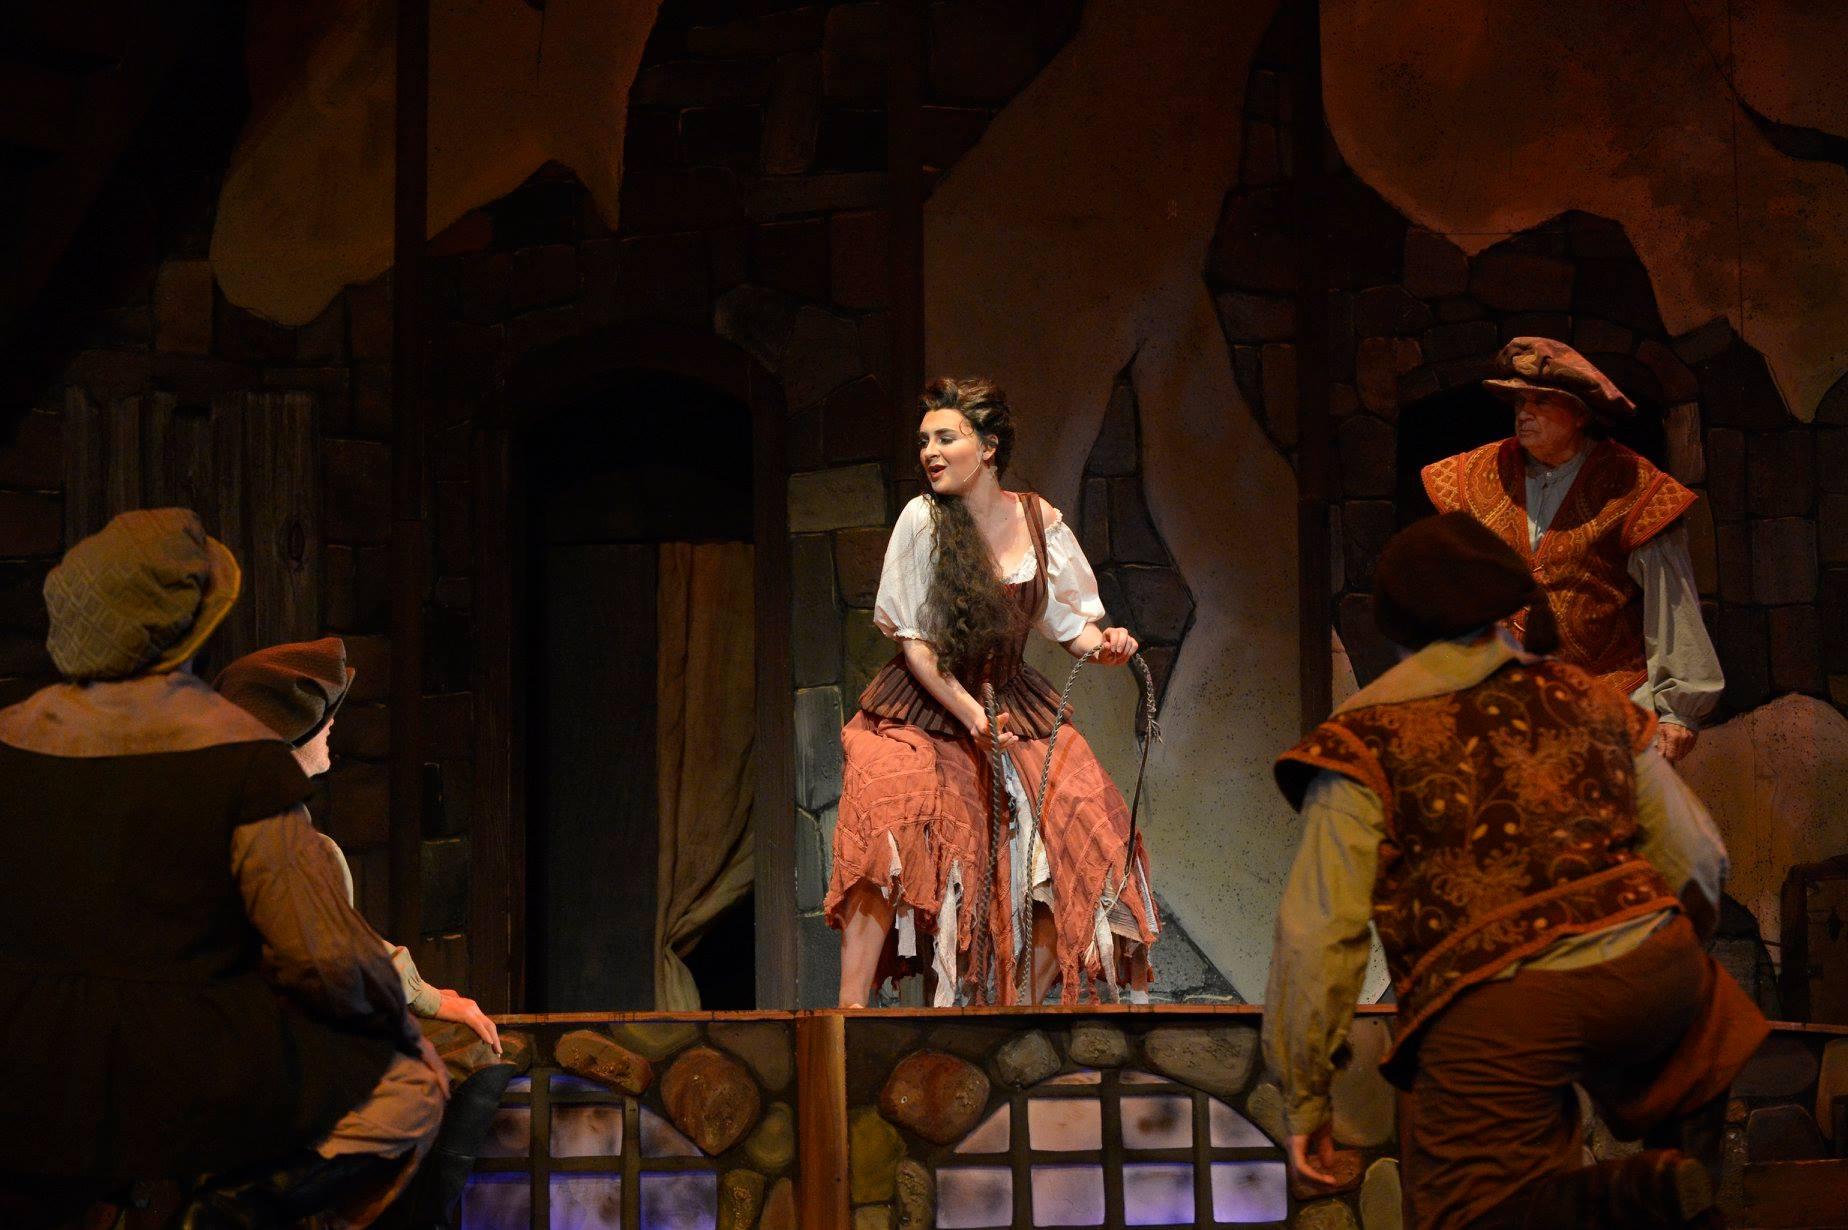 Aldonza in Man of La Mancha, Ralph Duke